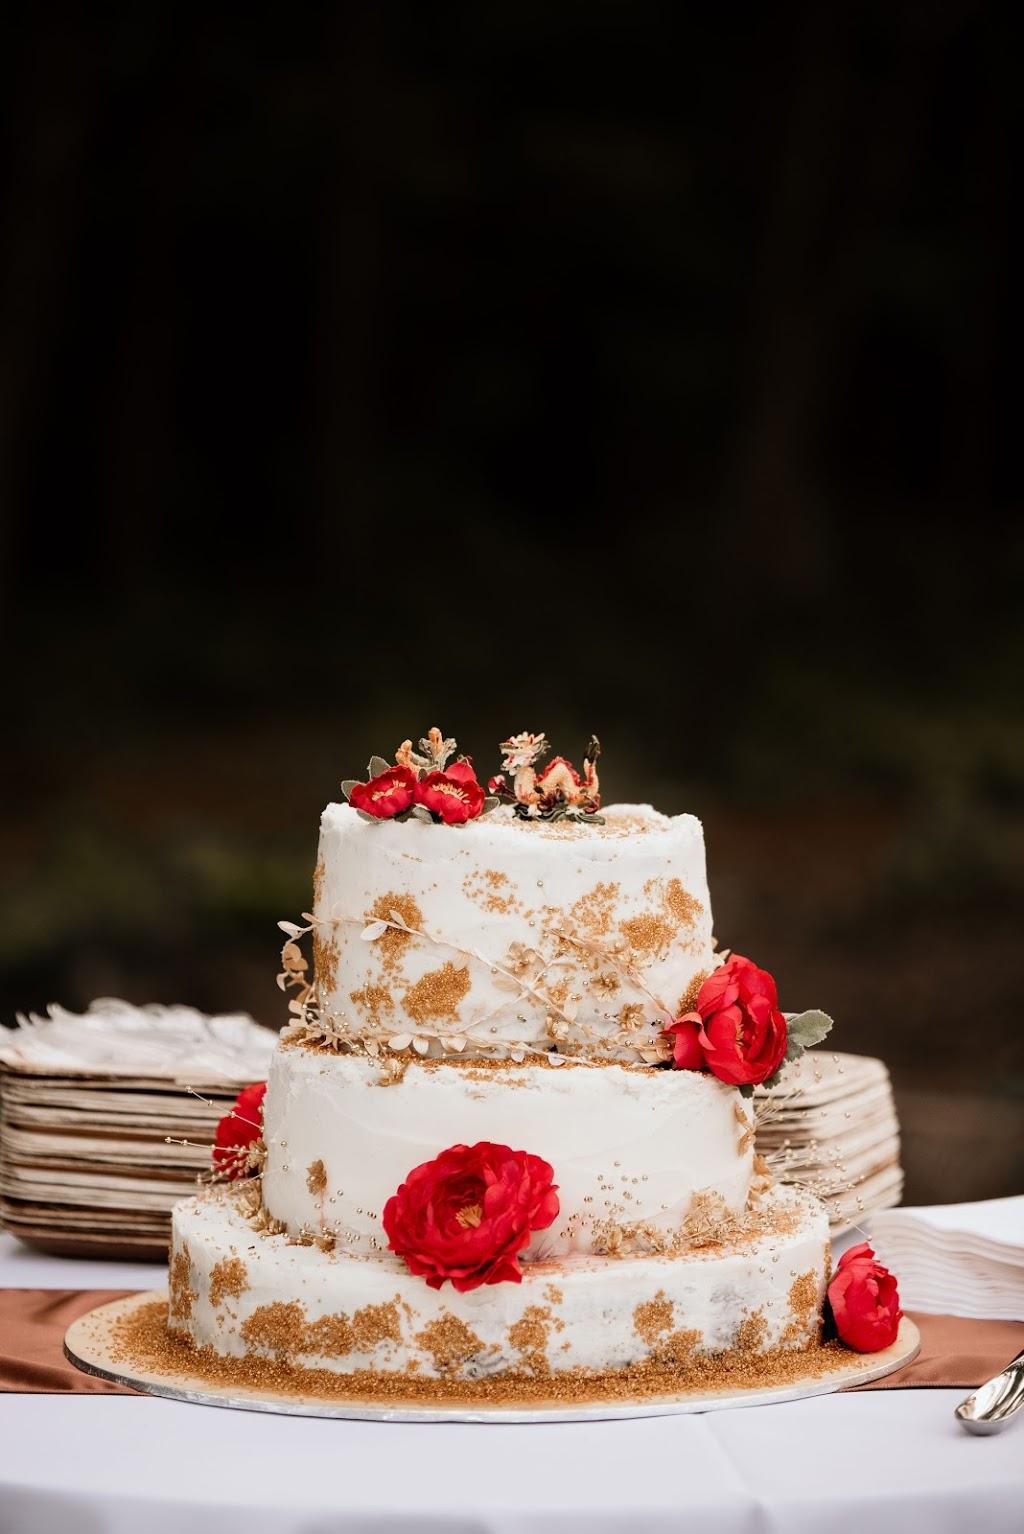 LiqCakes Bakery - bakery  | Photo 10 of 10 | Address: 3230 Jodeco Rd suite b, McDonough, GA 30253, USA | Phone: (678) 271-2838